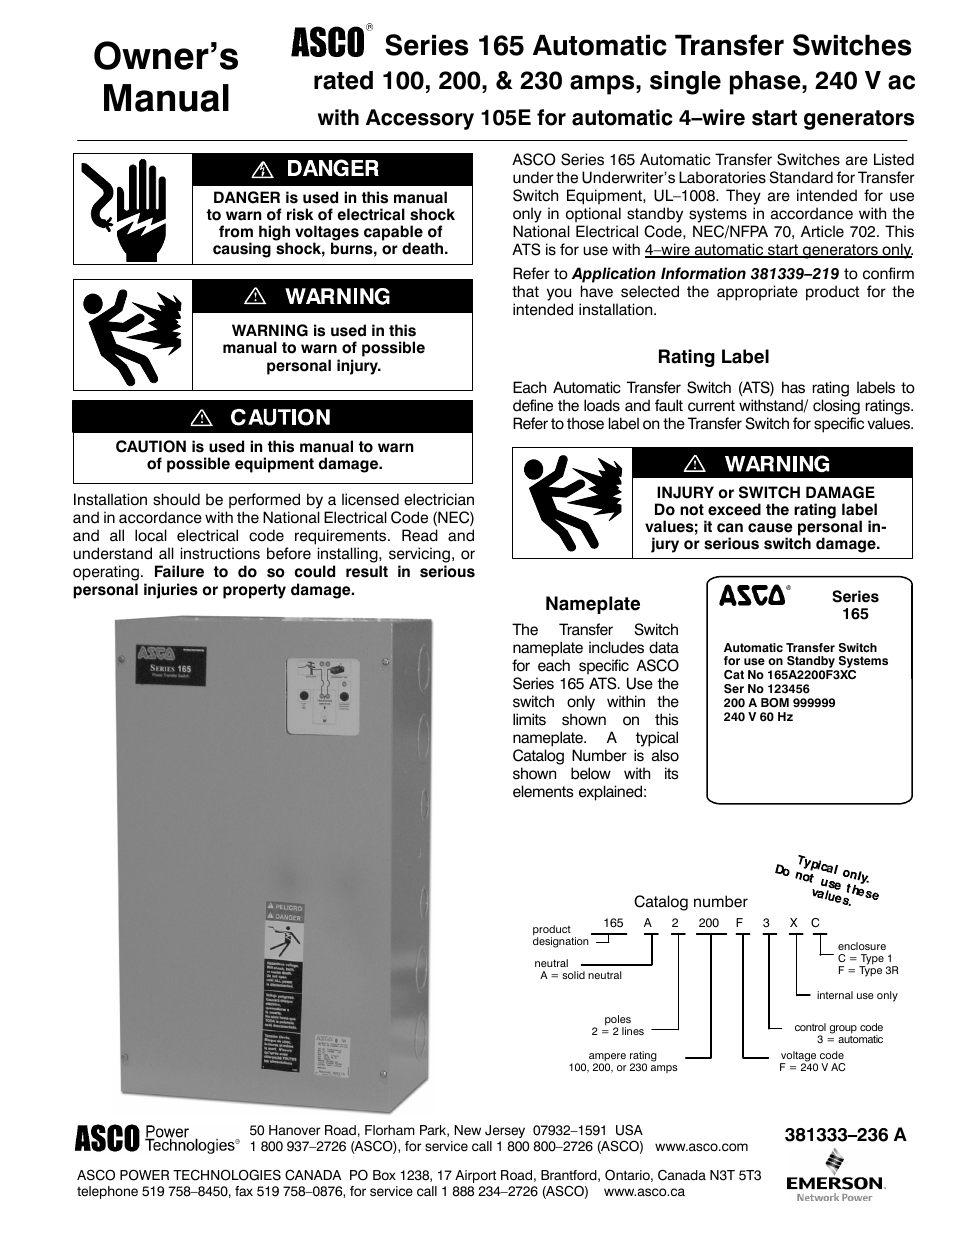 asco 7000 wiring diagram klf 300 c diagrams data 8210g95 120v library guitar 165 transfer switch